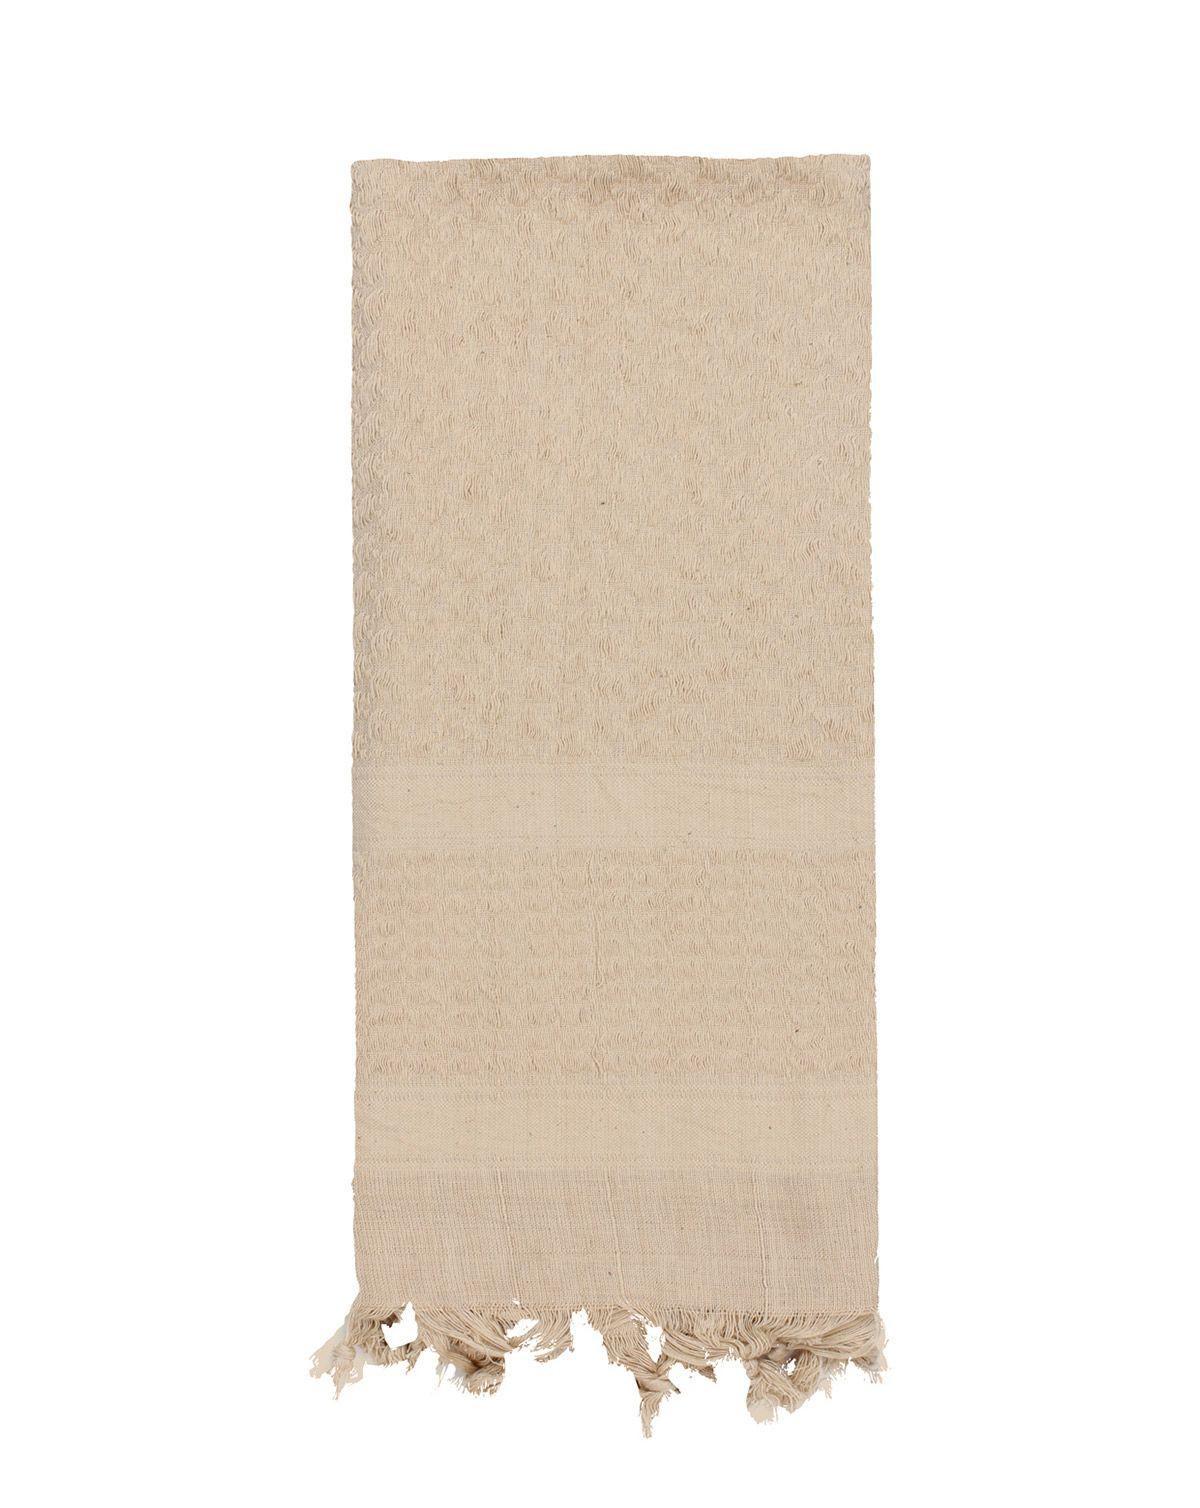 Image of   Rothco Deluxe Partisan Tørklæde Ensfarvet (Khaki, One Size)